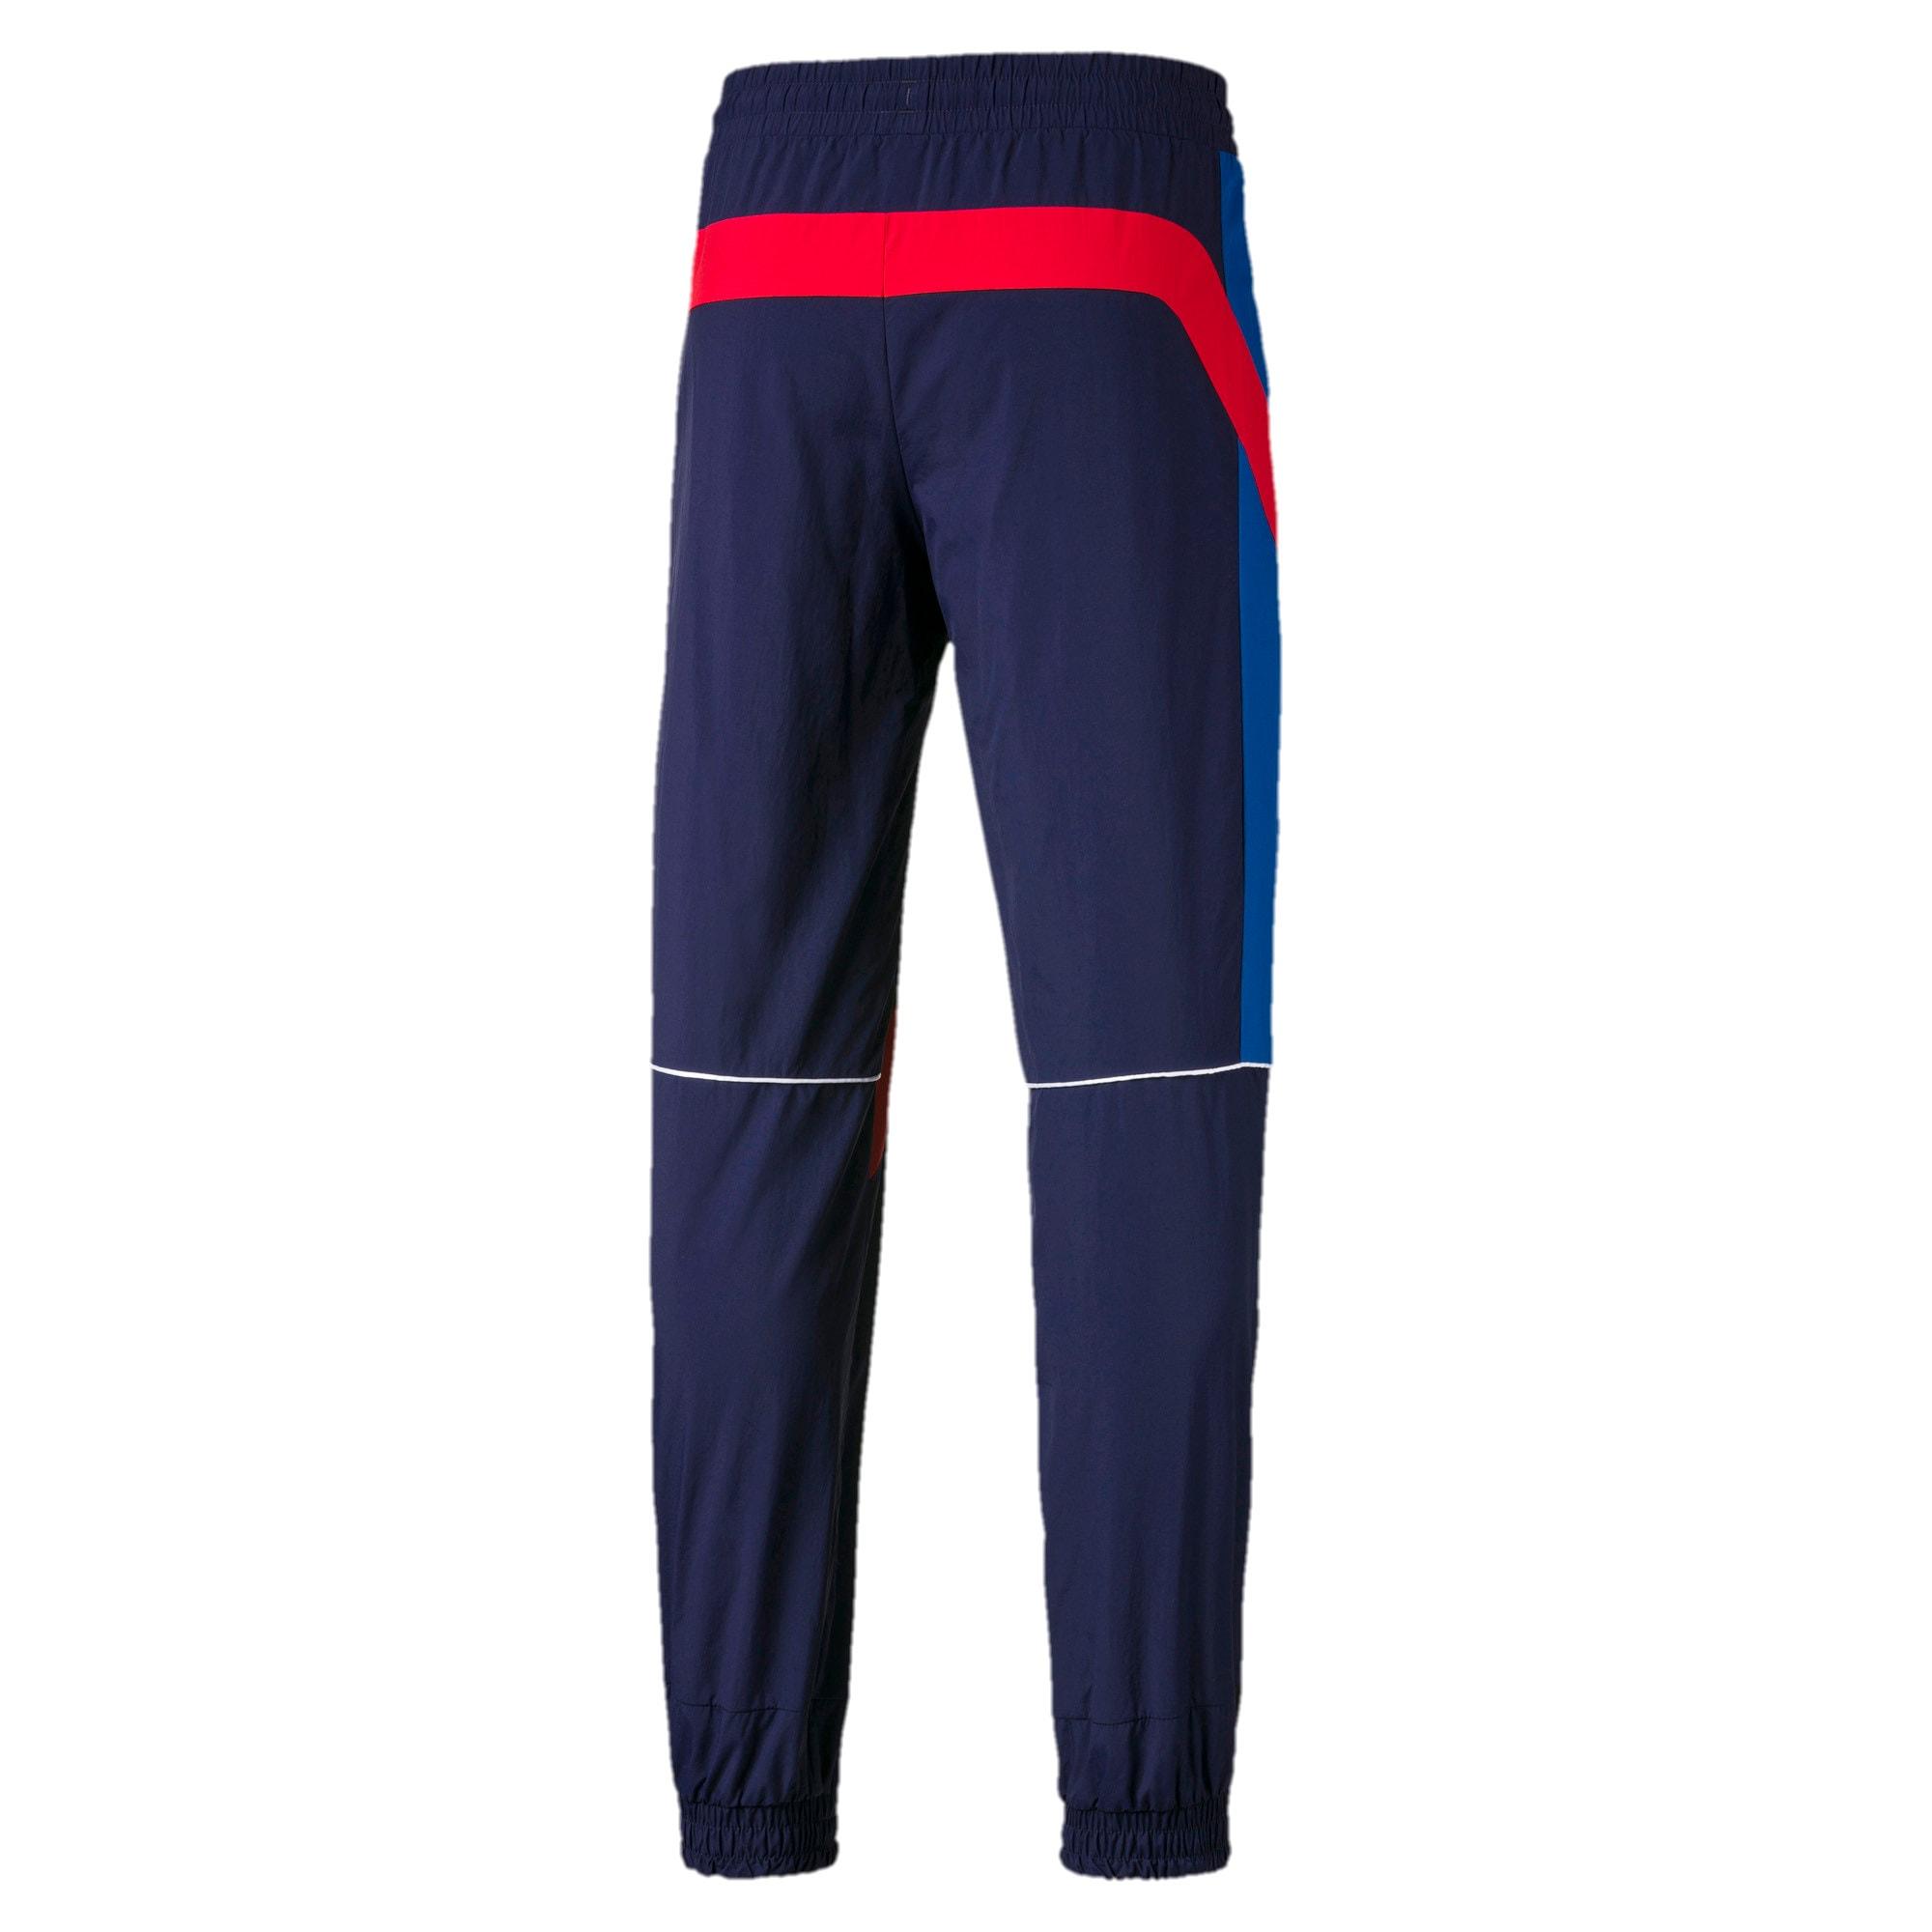 Thumbnail 3 of Ferrari Street Woven Men's Pants, Galaxy Blue, medium